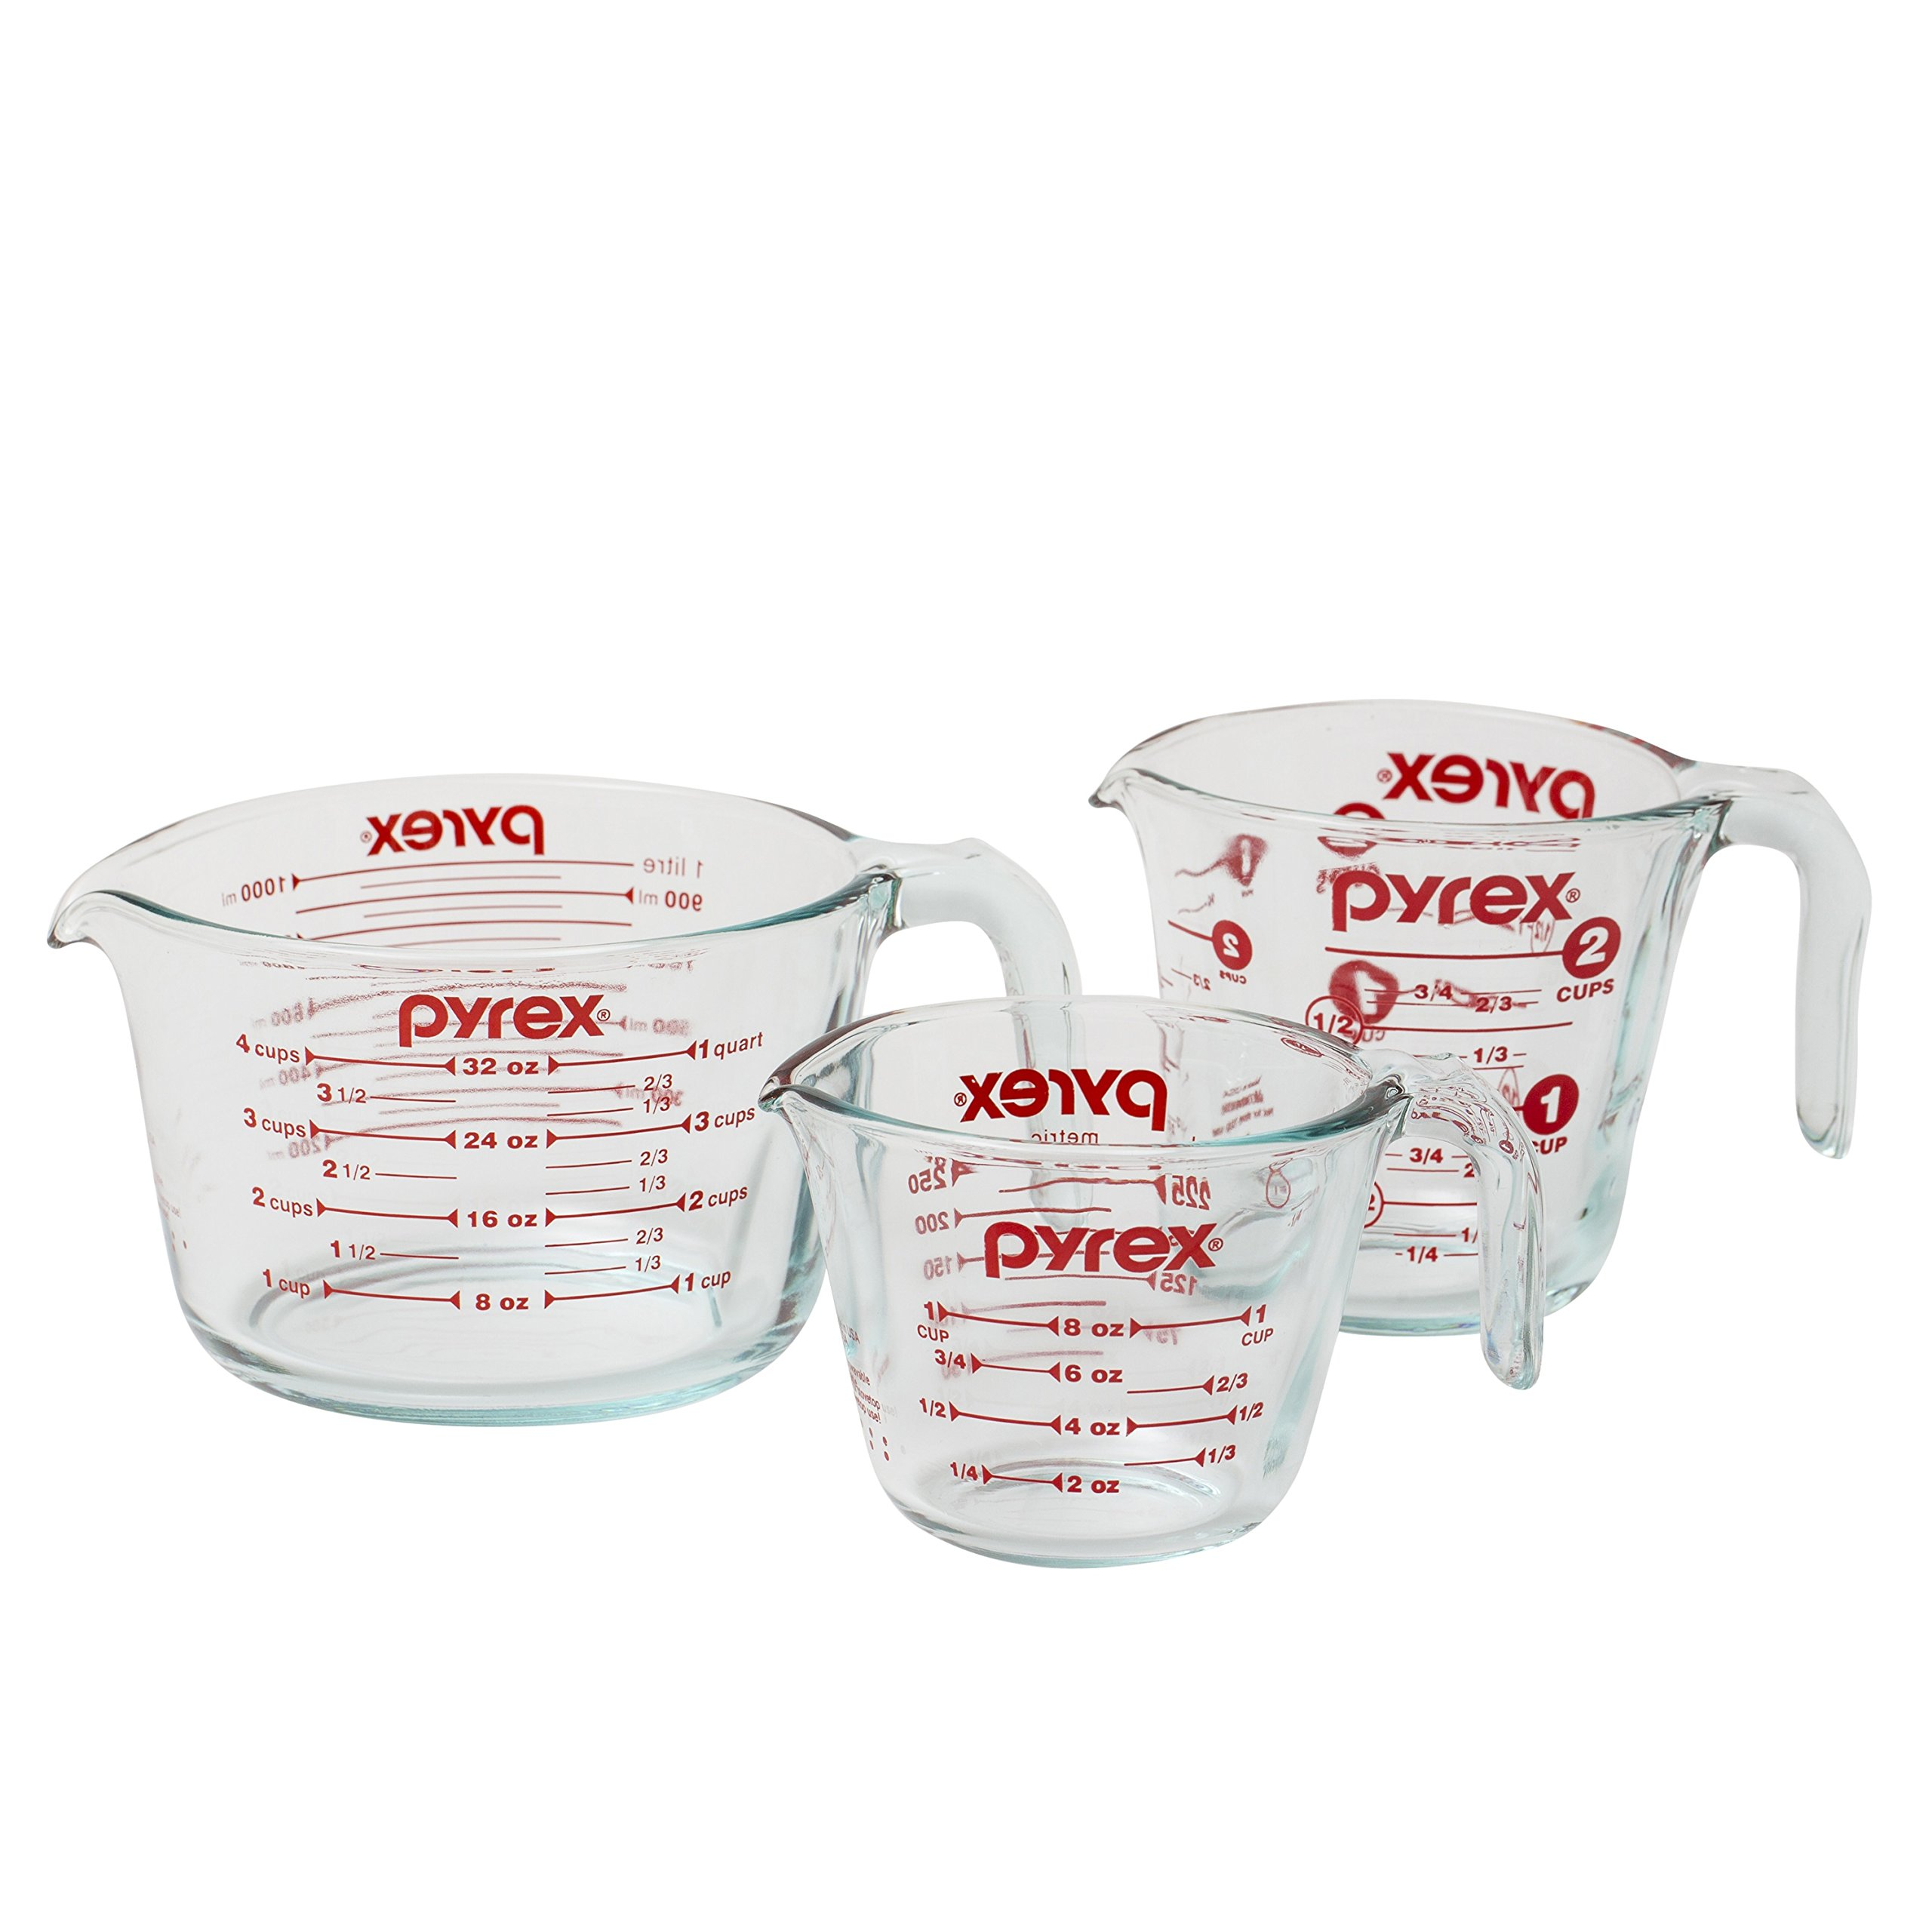 Pyrex 3-Piece Glass Measuring Cup Set (1118990)